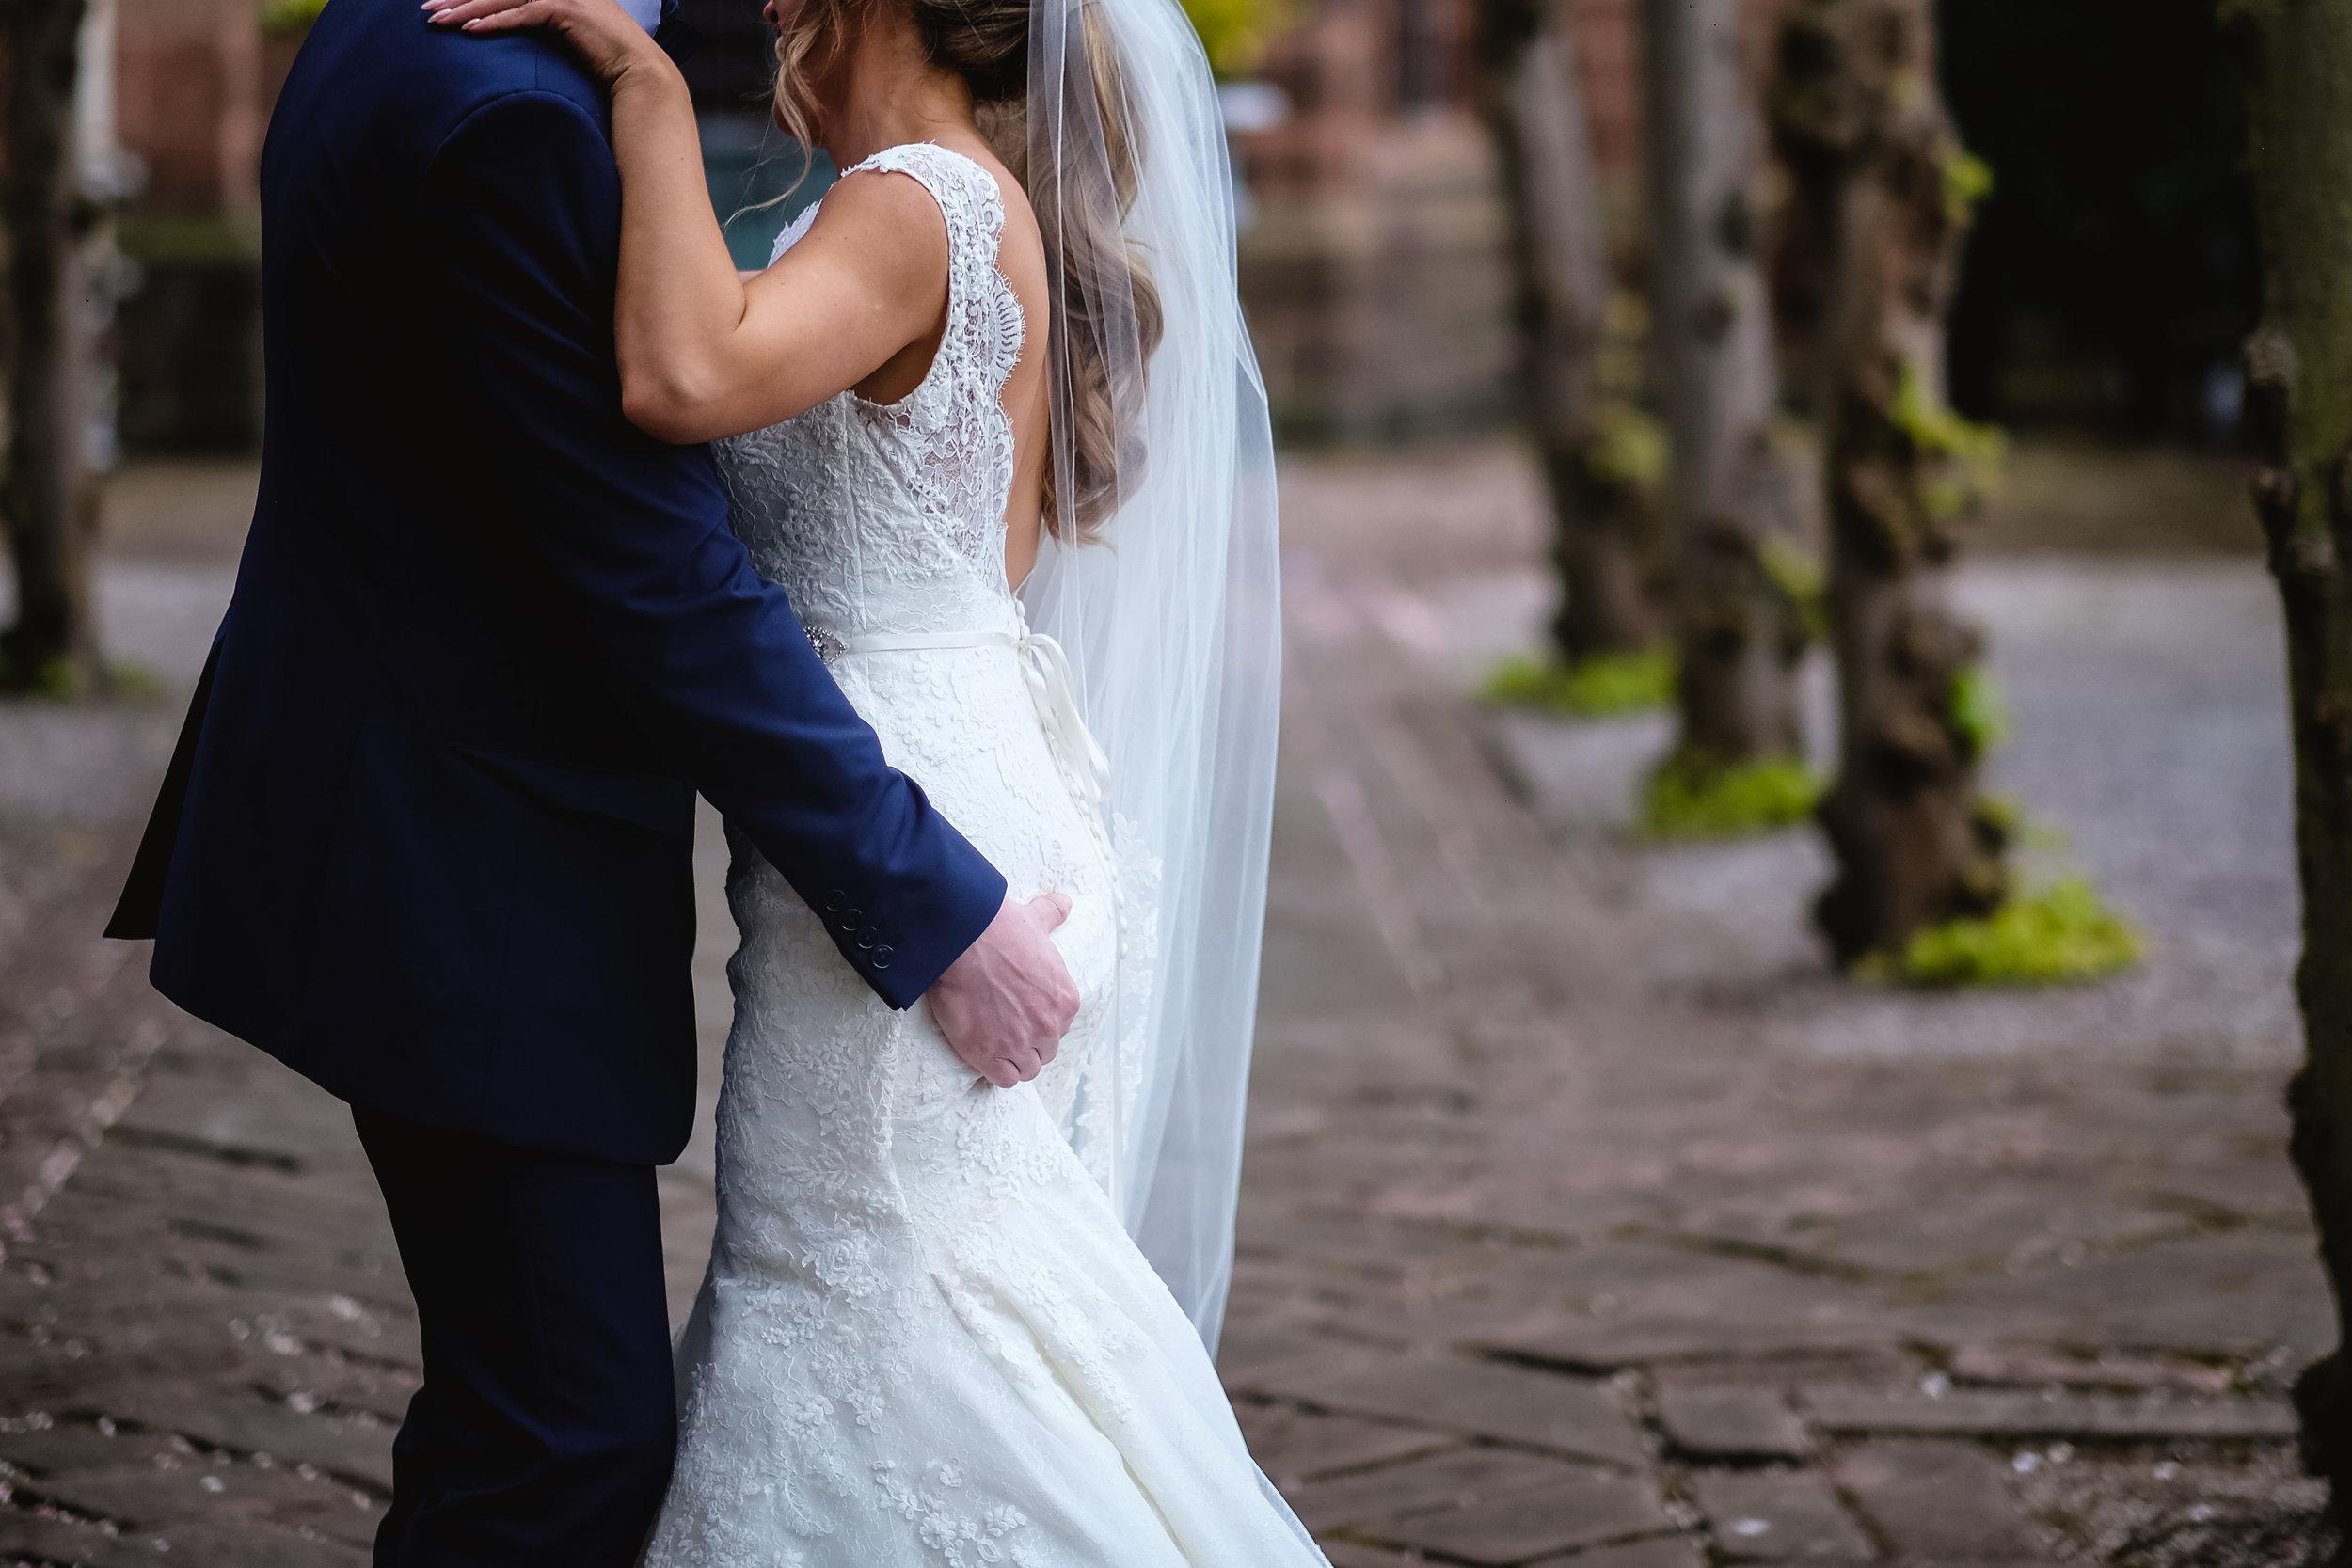 Thornton manor wedding photography cheshire wedding photographer liverpool manchester warrington chester wirral wedding BLOG (79 of 108).jpg